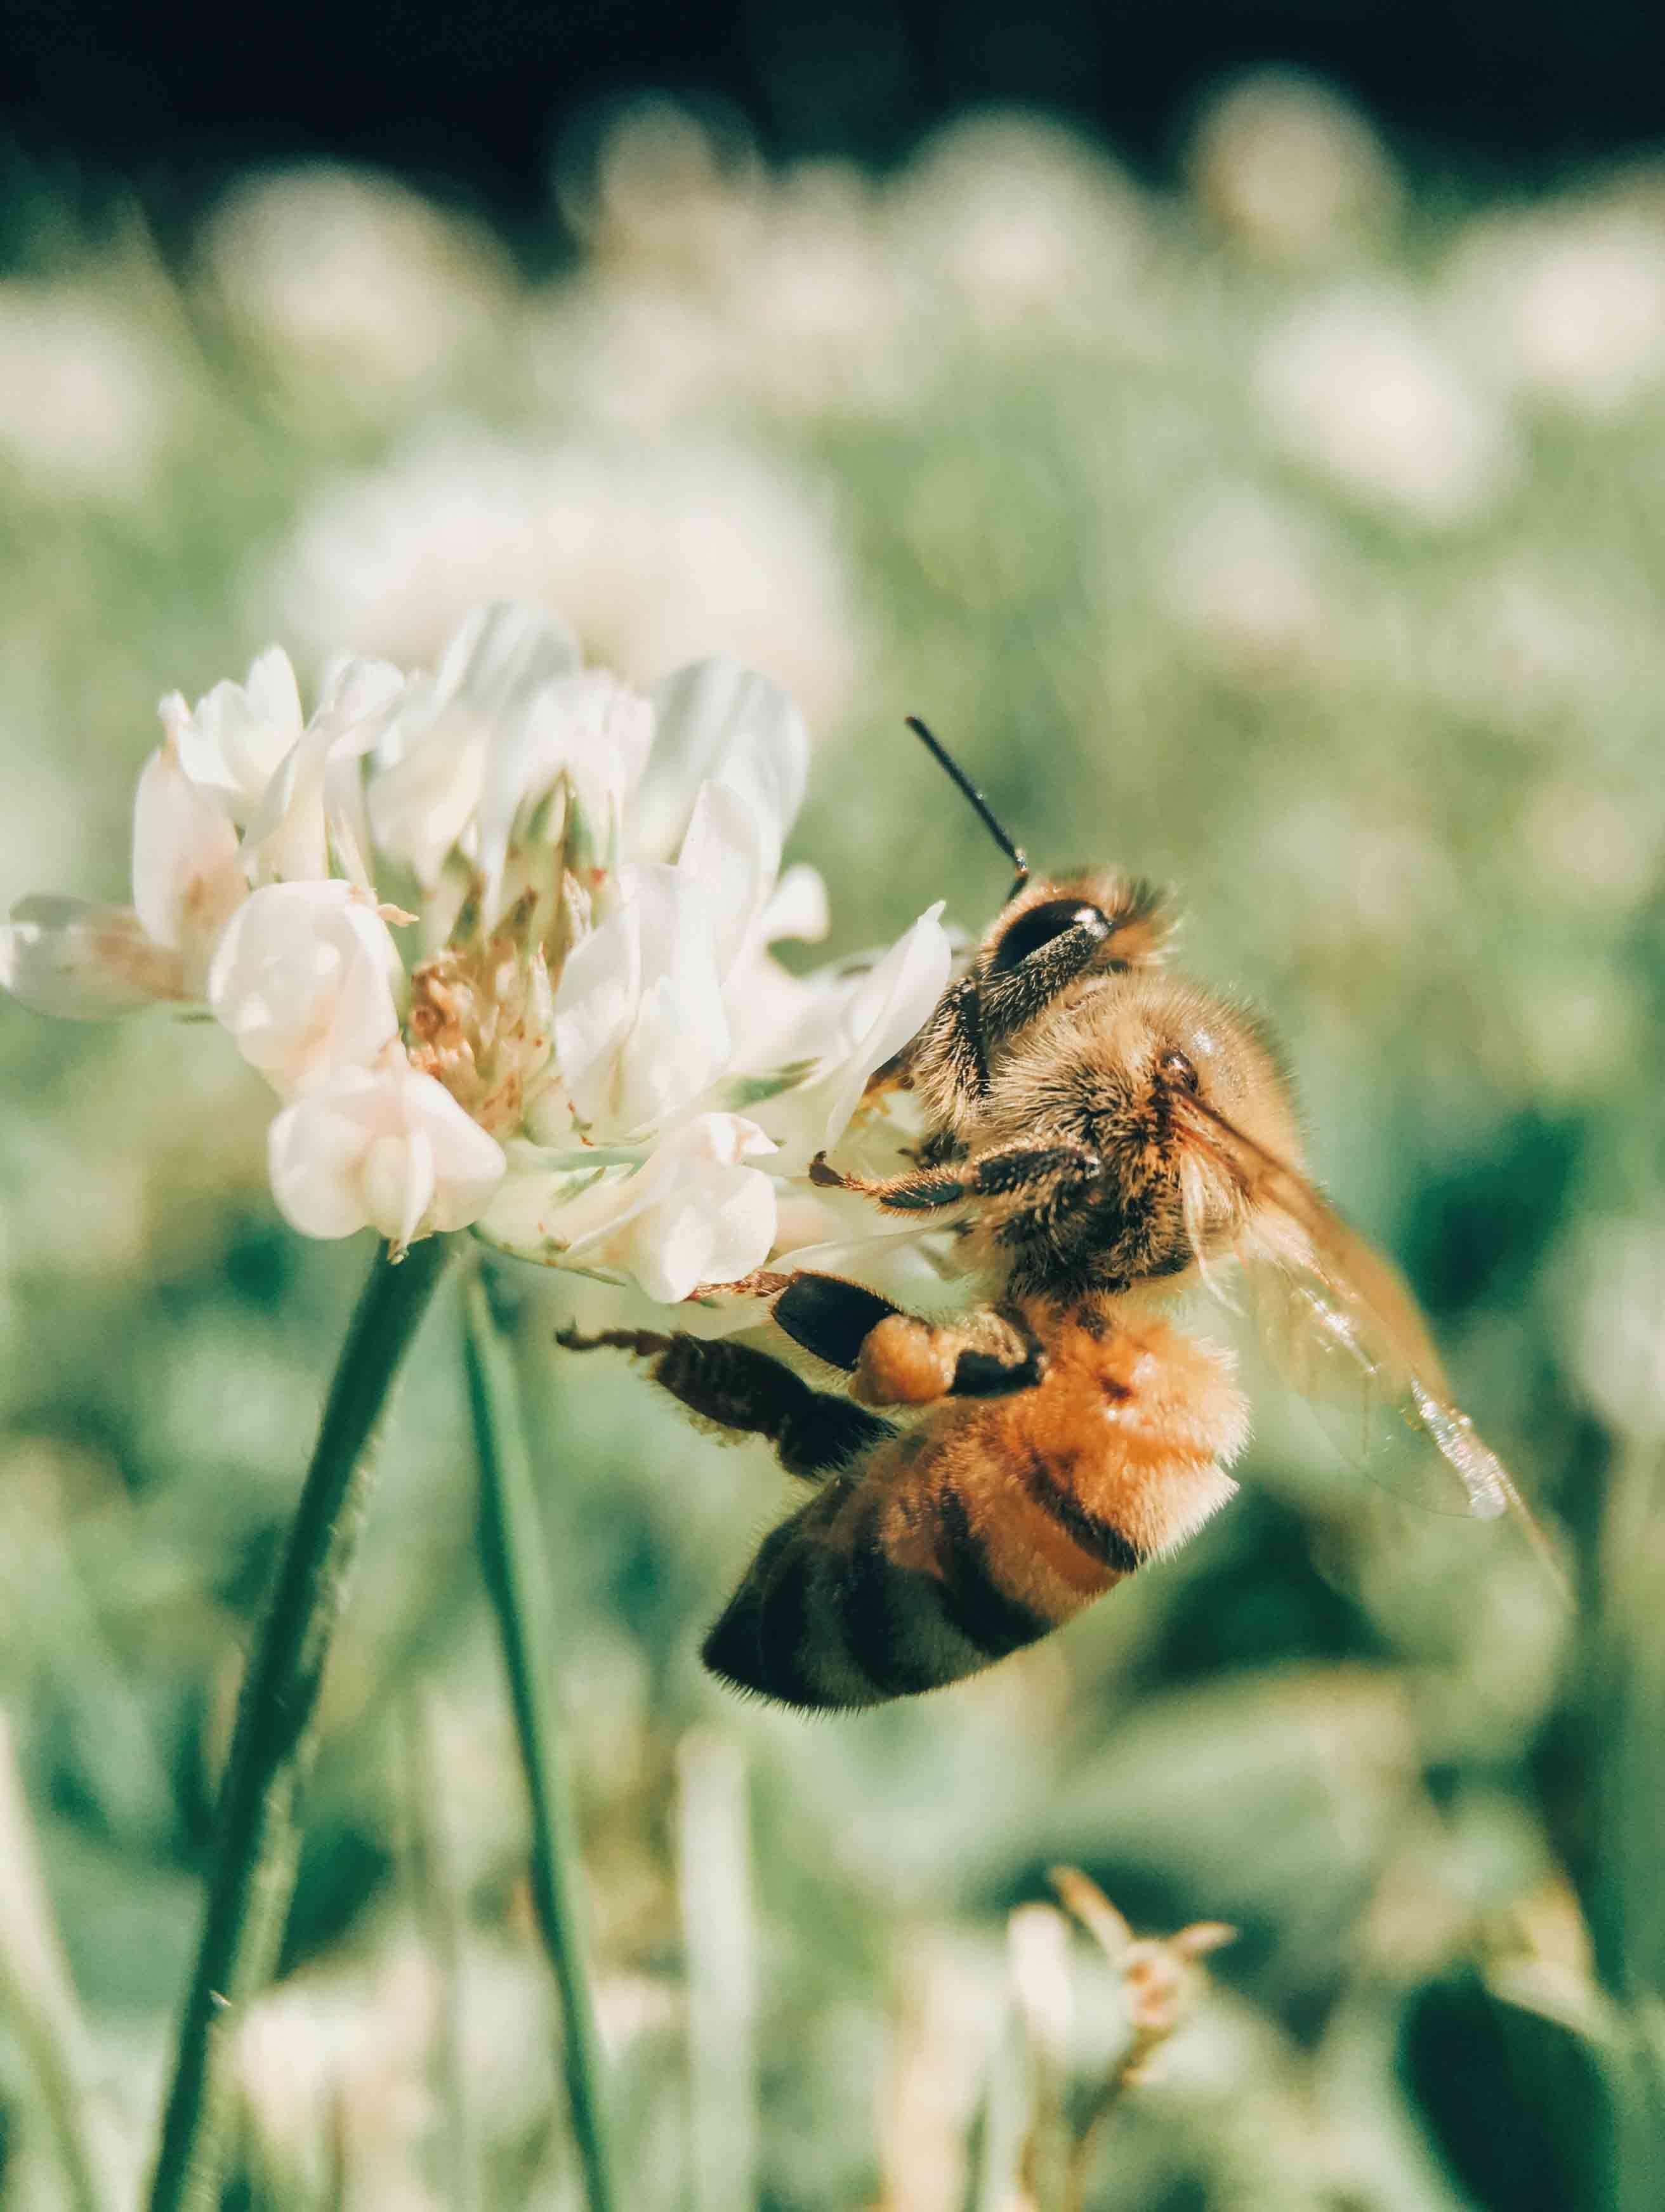 lisa brandao naturopathie abeille butinant